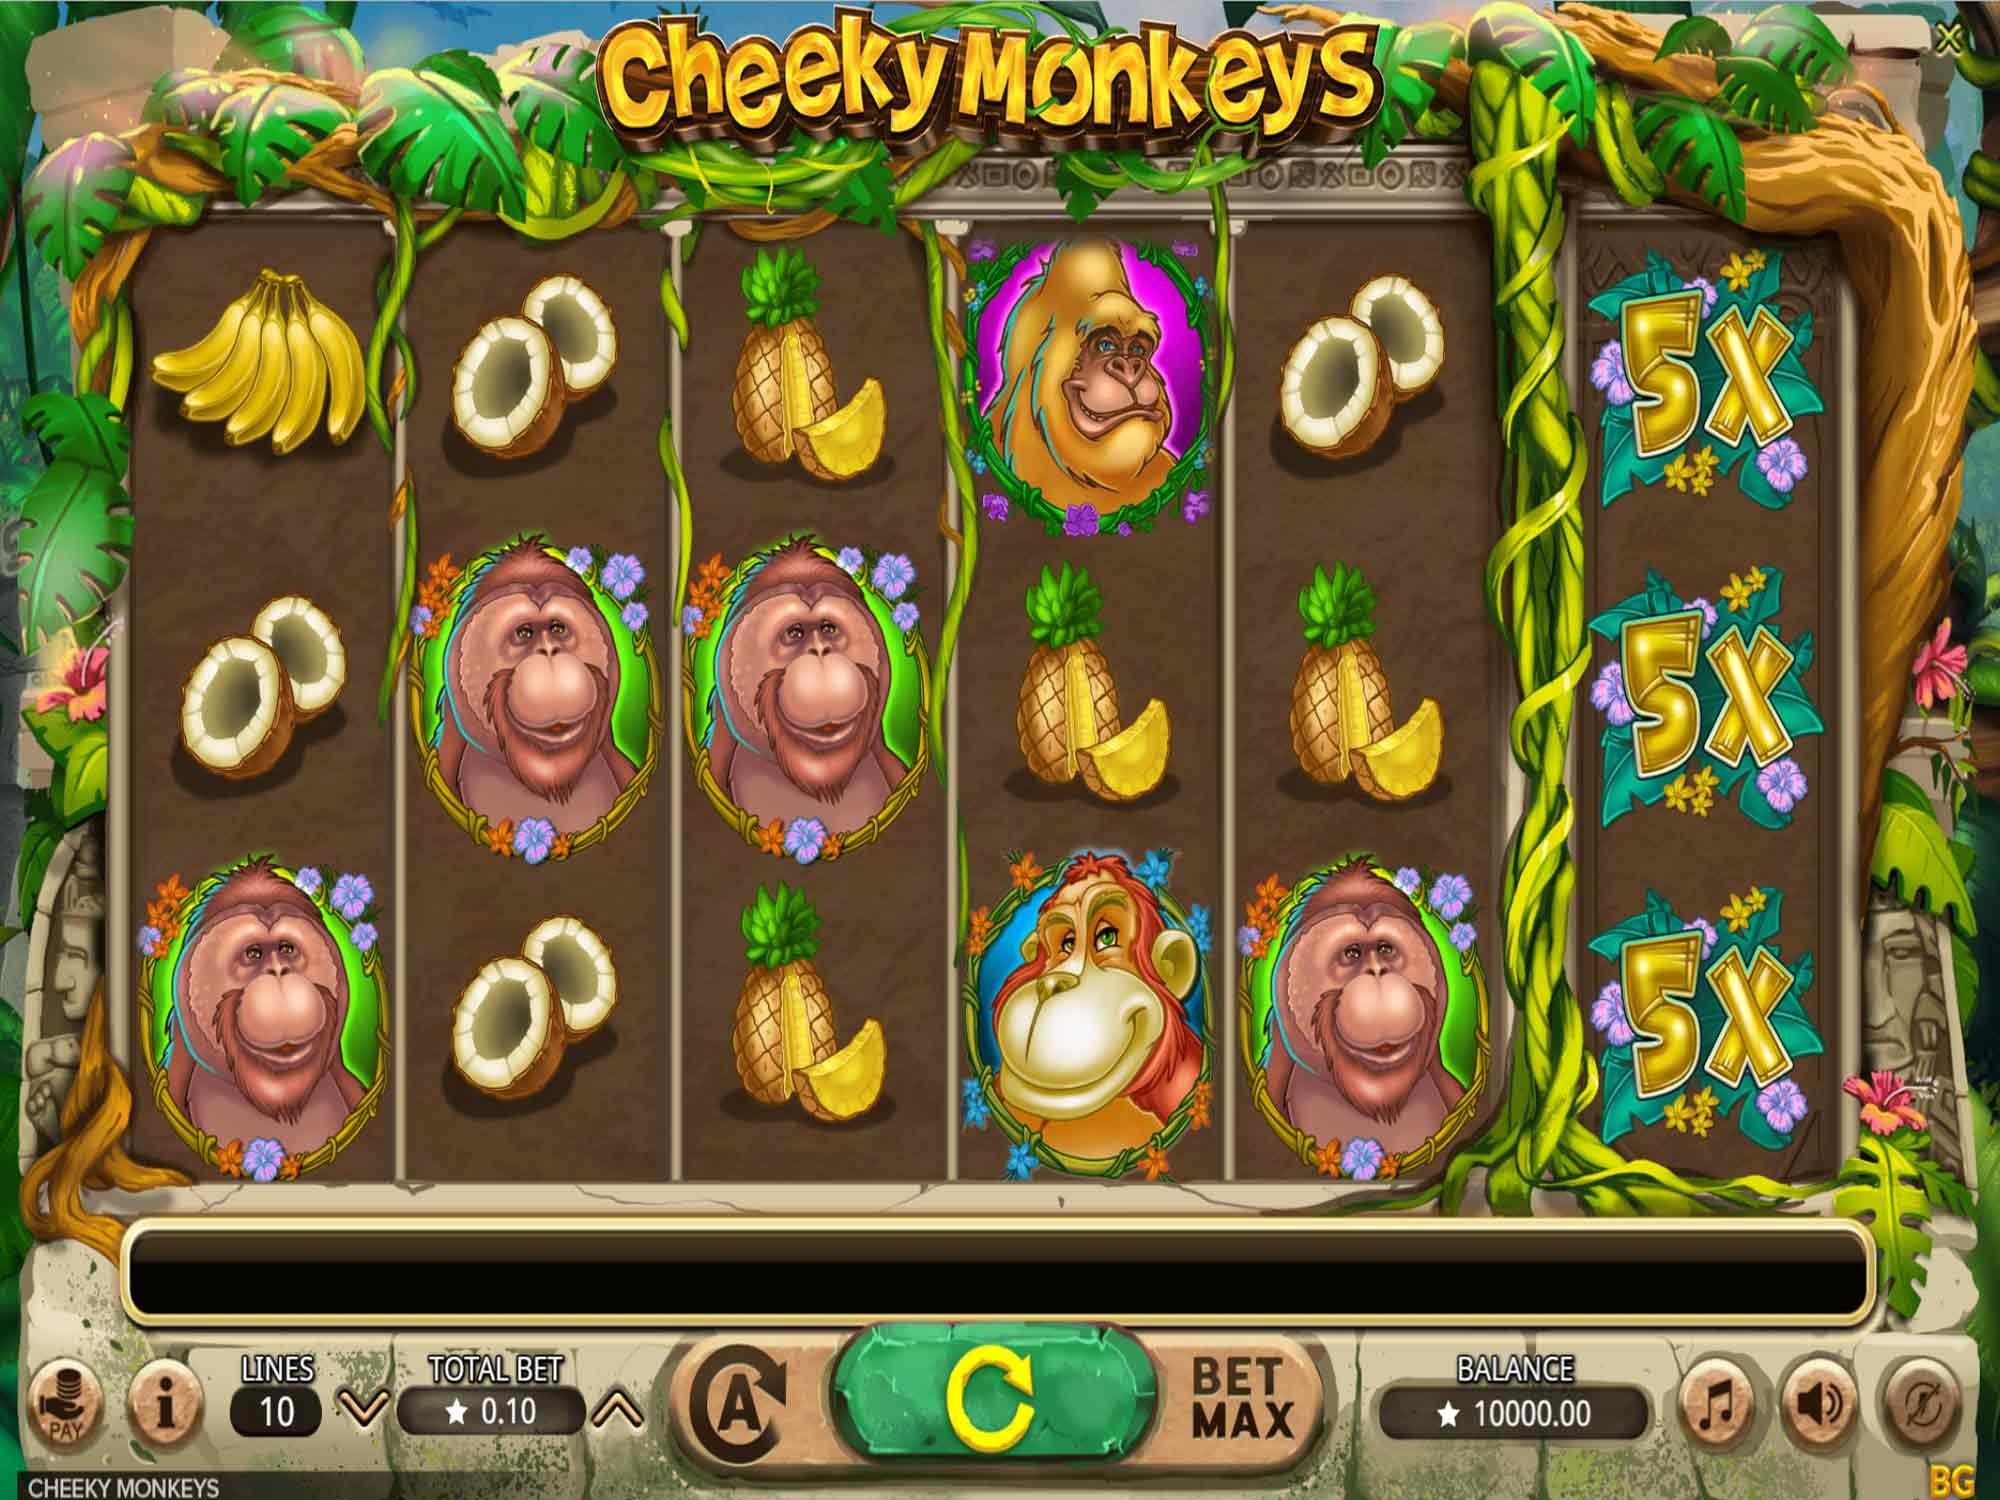 Cheeky Monkeys demo